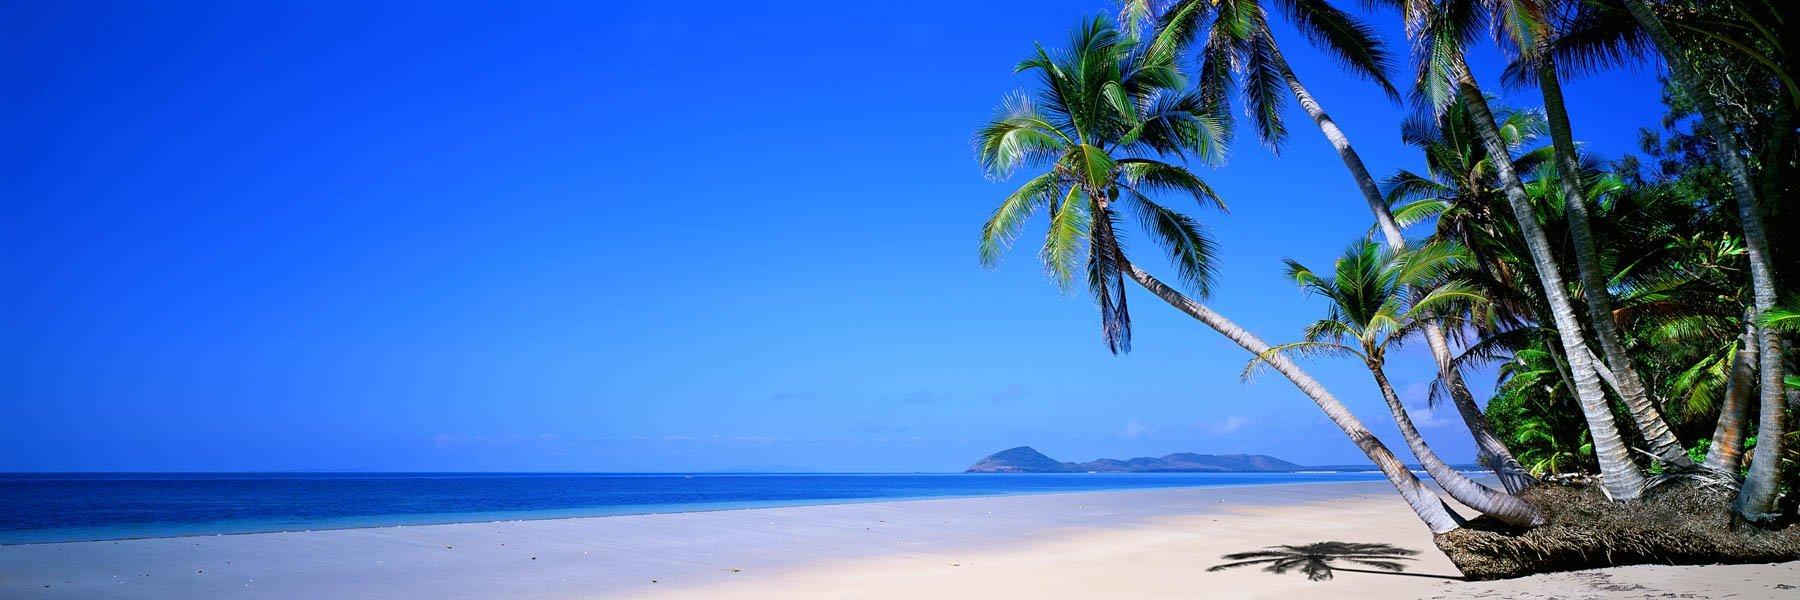 Palm trees on Chilli Beach, Cape York, Qld, Australia.